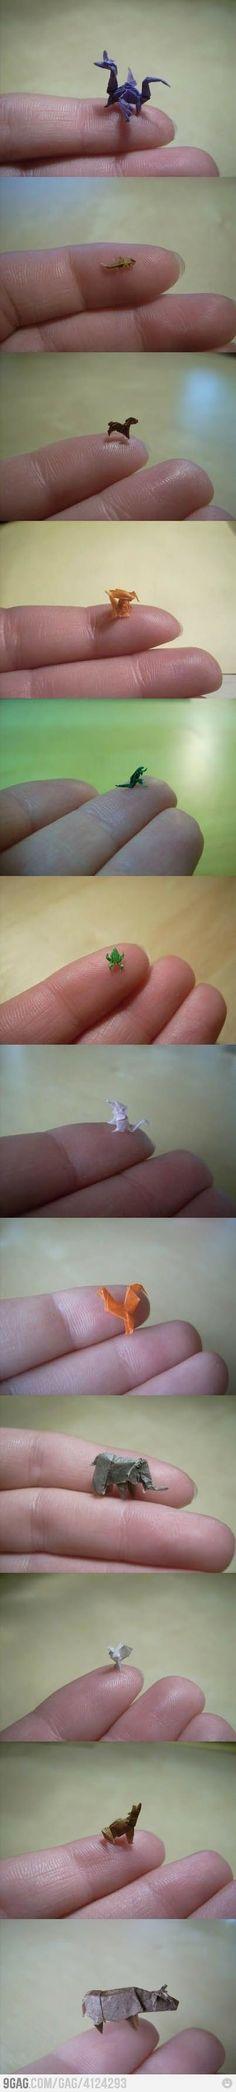 Origami lvl: expert.